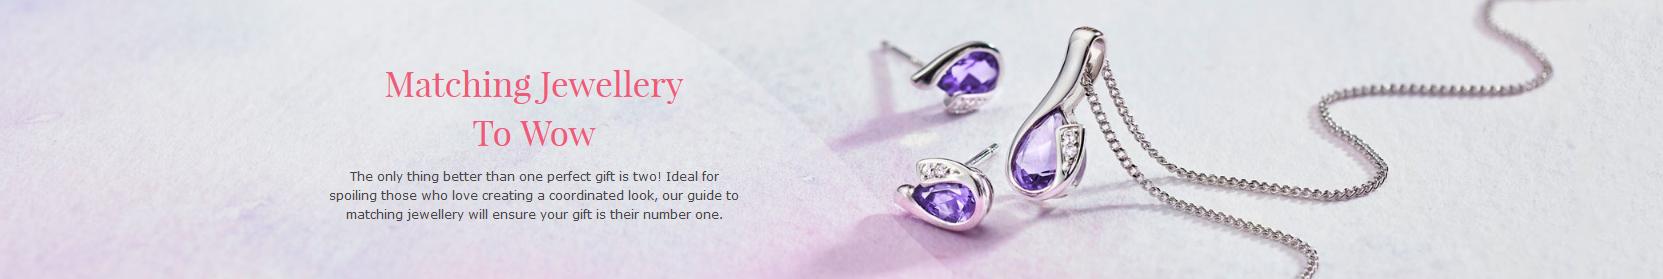 Screenshot-2018-2-3 Matching Jewellery To Wow Beaverbrooks the Jewellers.png